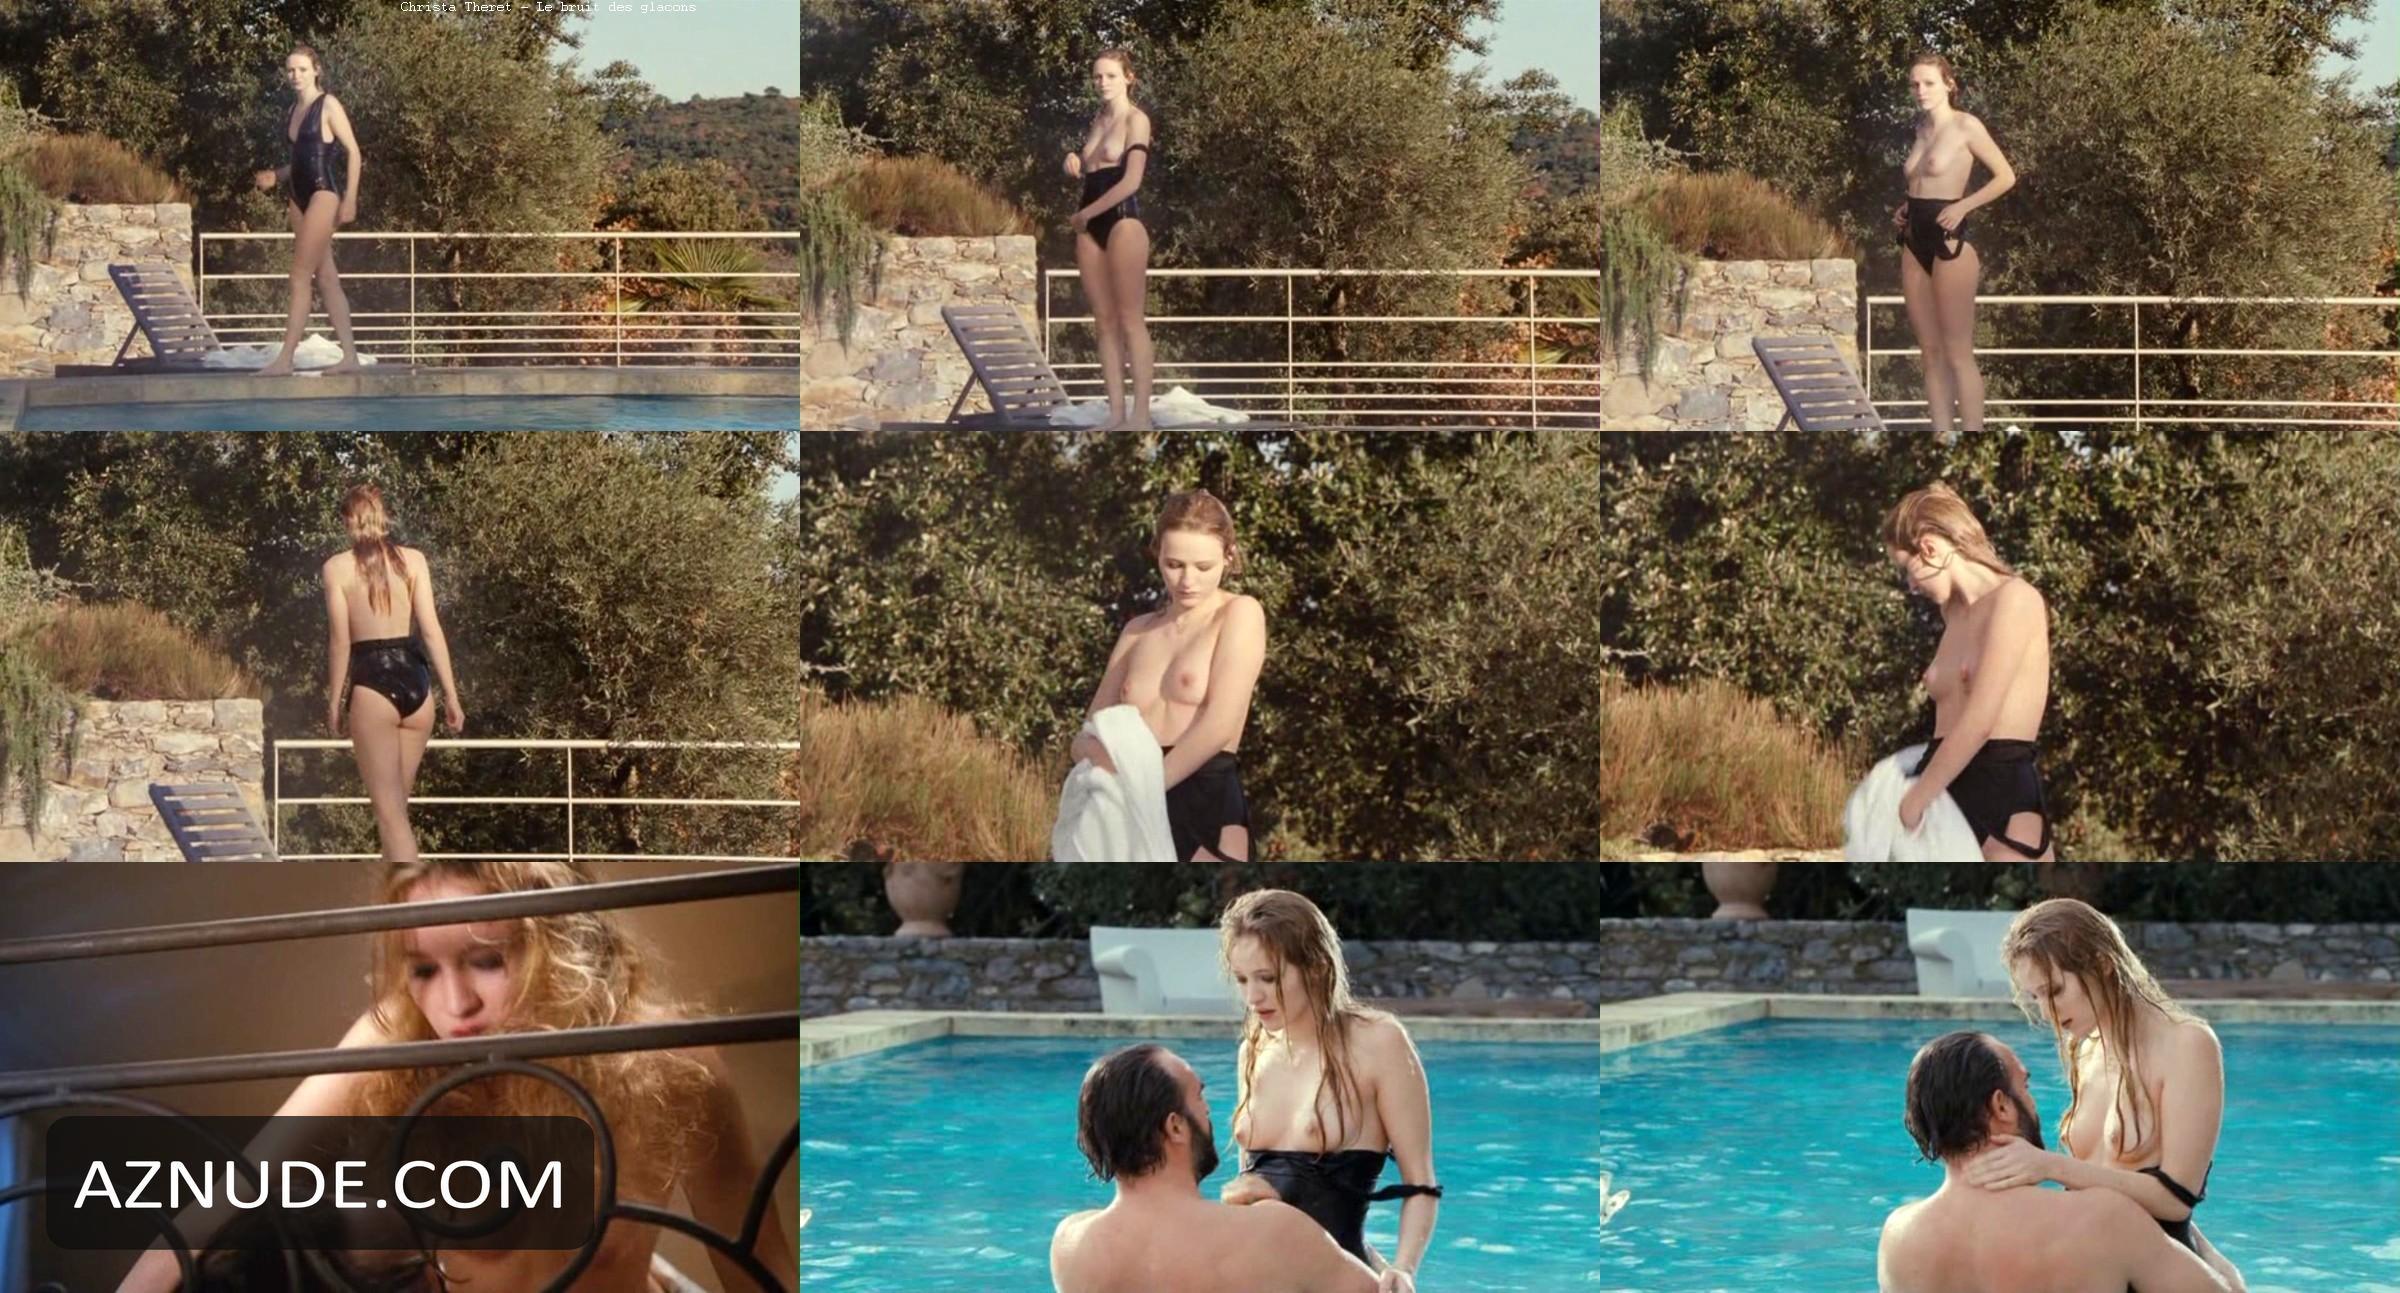 Christa theret renoir - 1 part 5